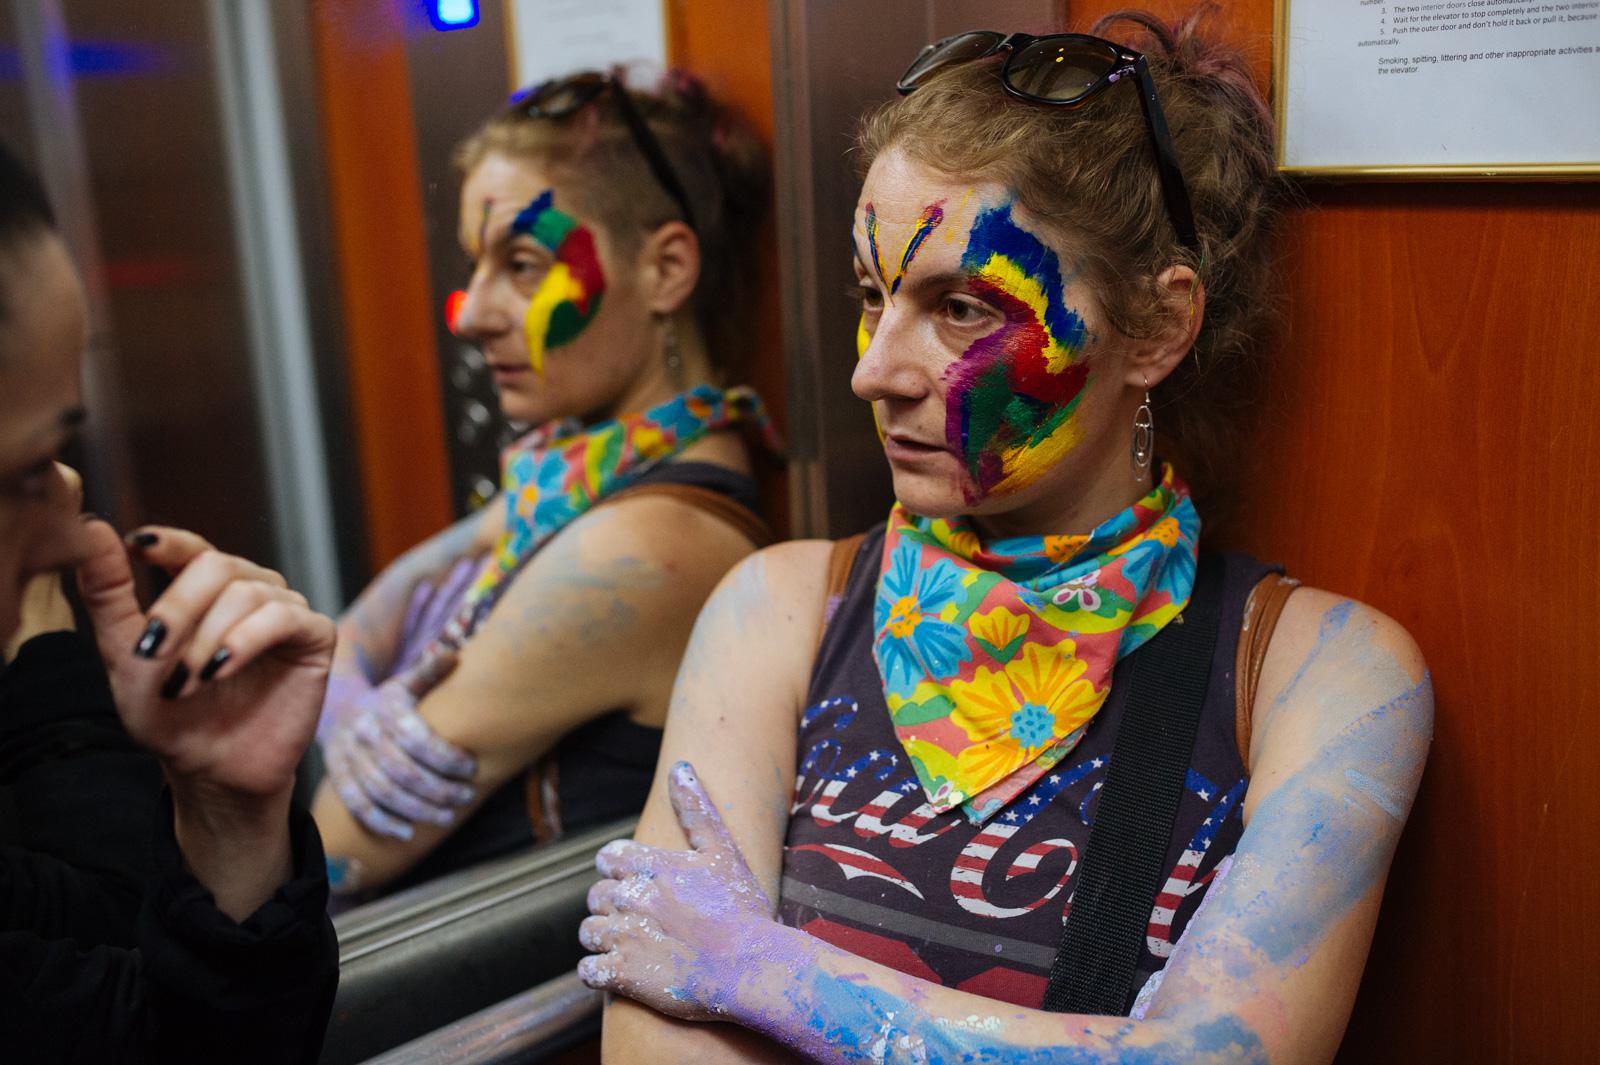 14_PHM_MKD_ColorfulRevolution_8611.jpg